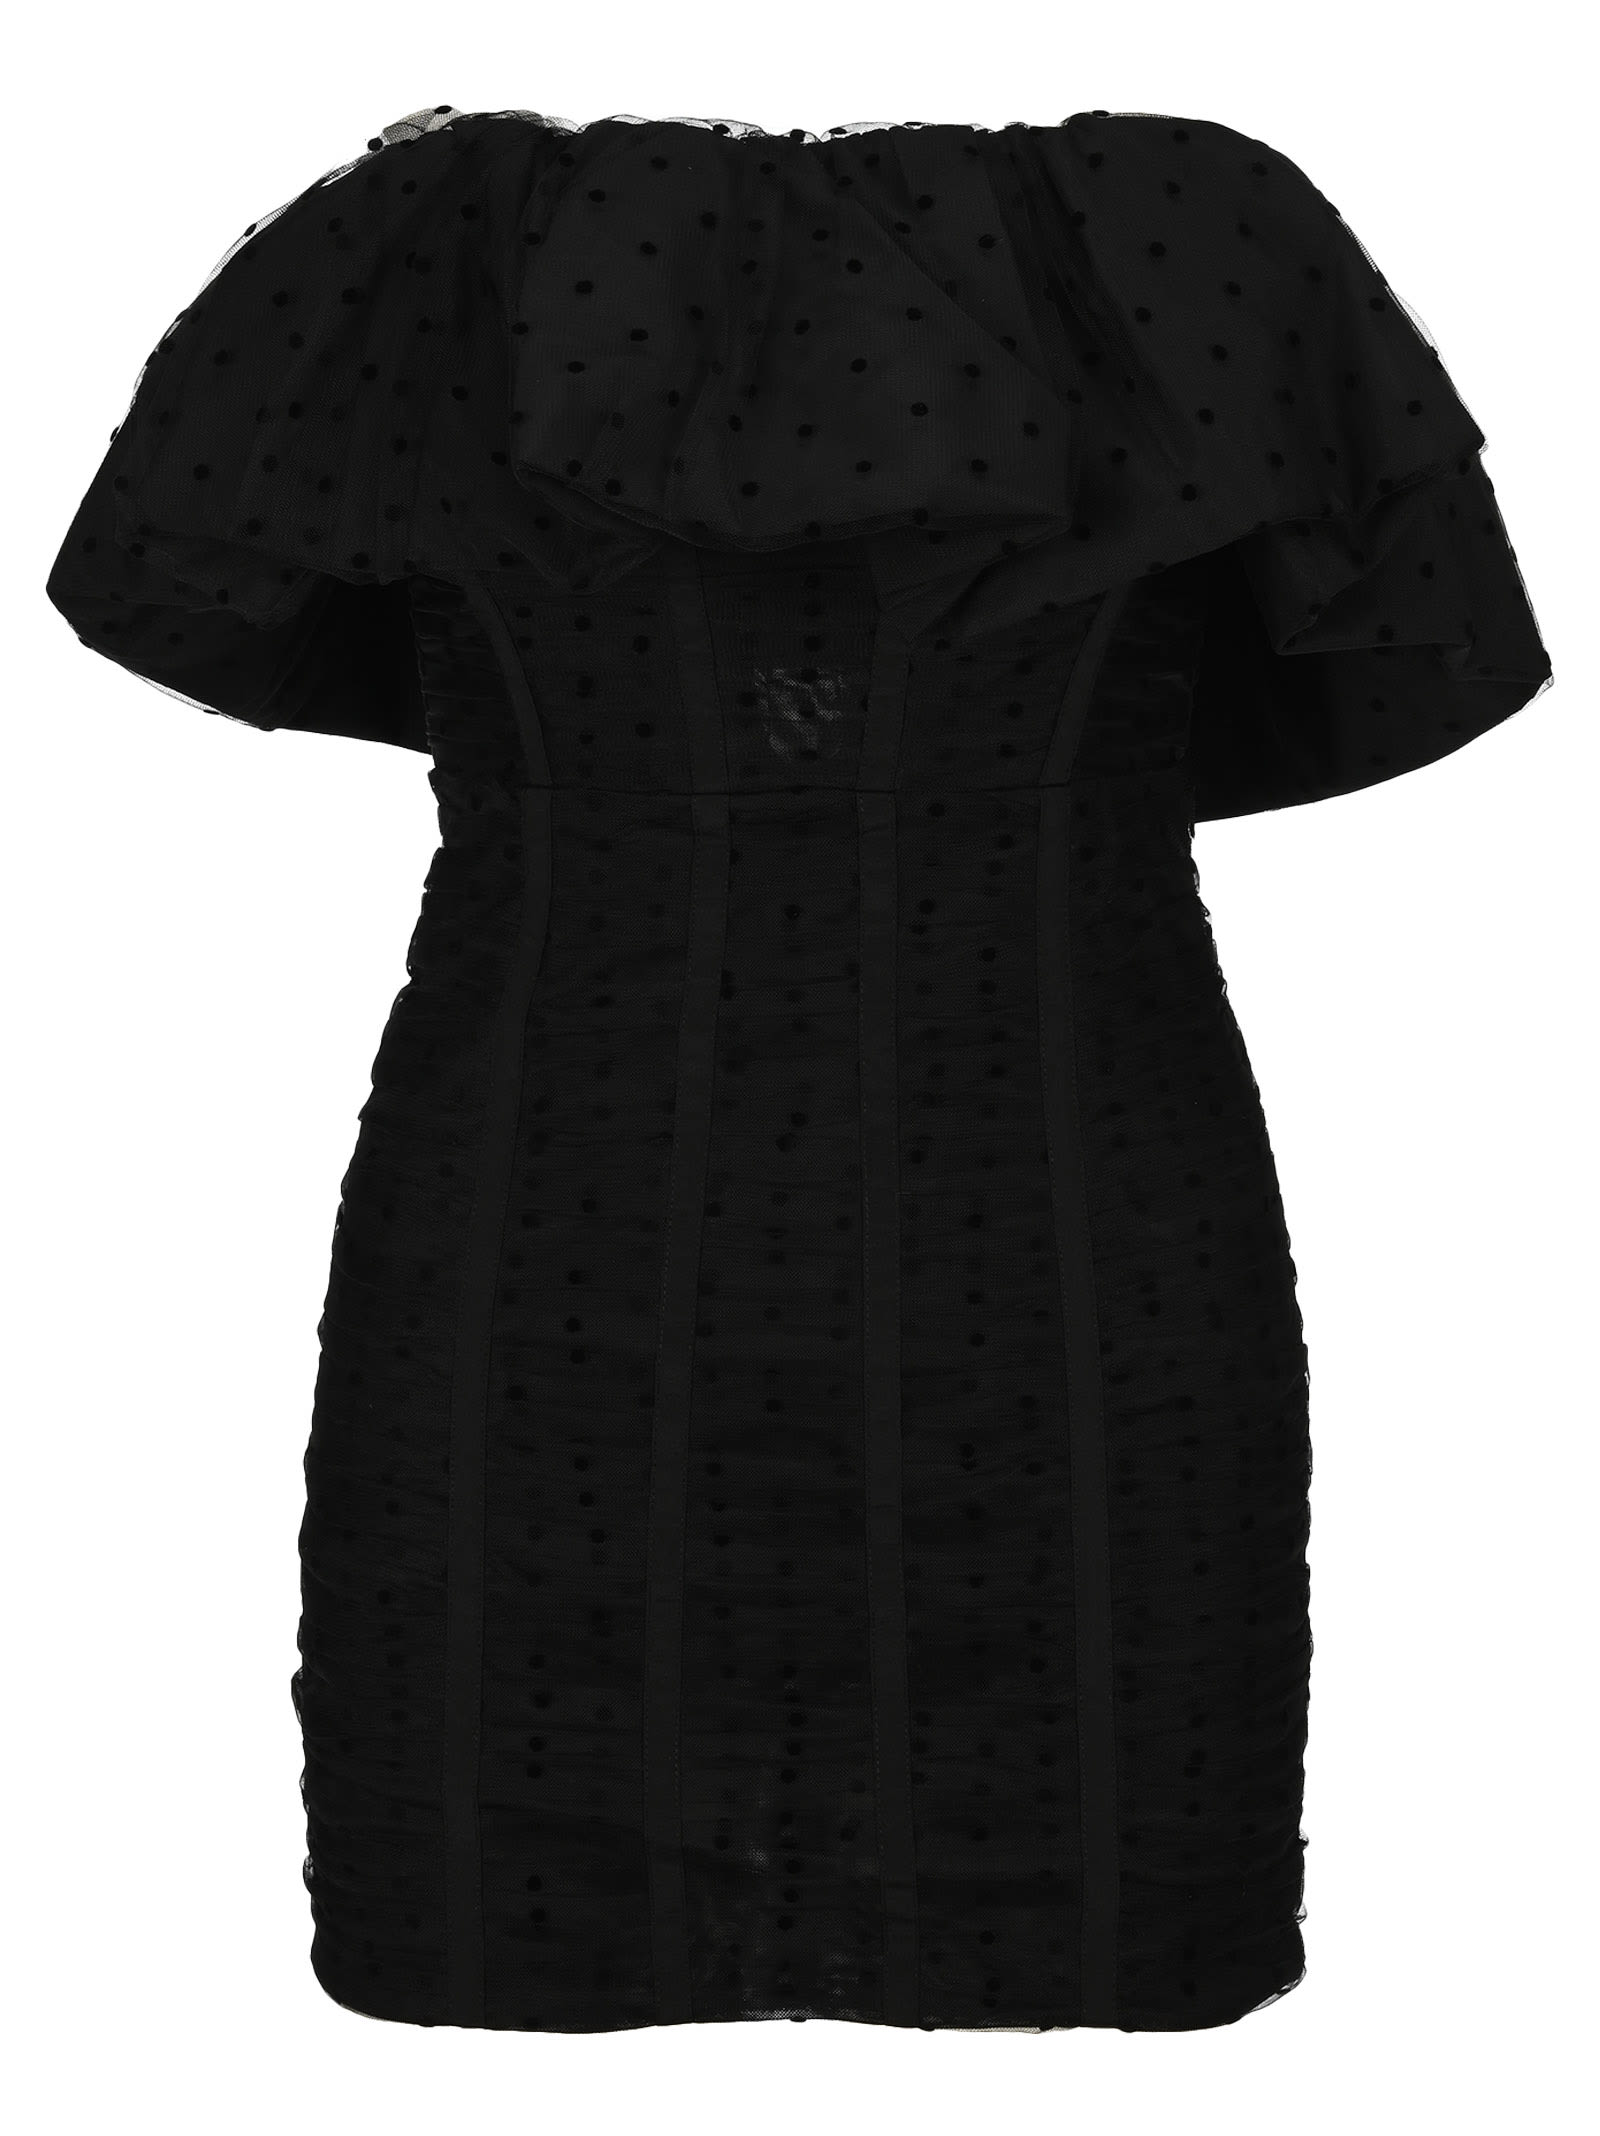 Buy Self Portrait Black Dot Mesh Frill Mini Dress online, shop self-portrait with free shipping